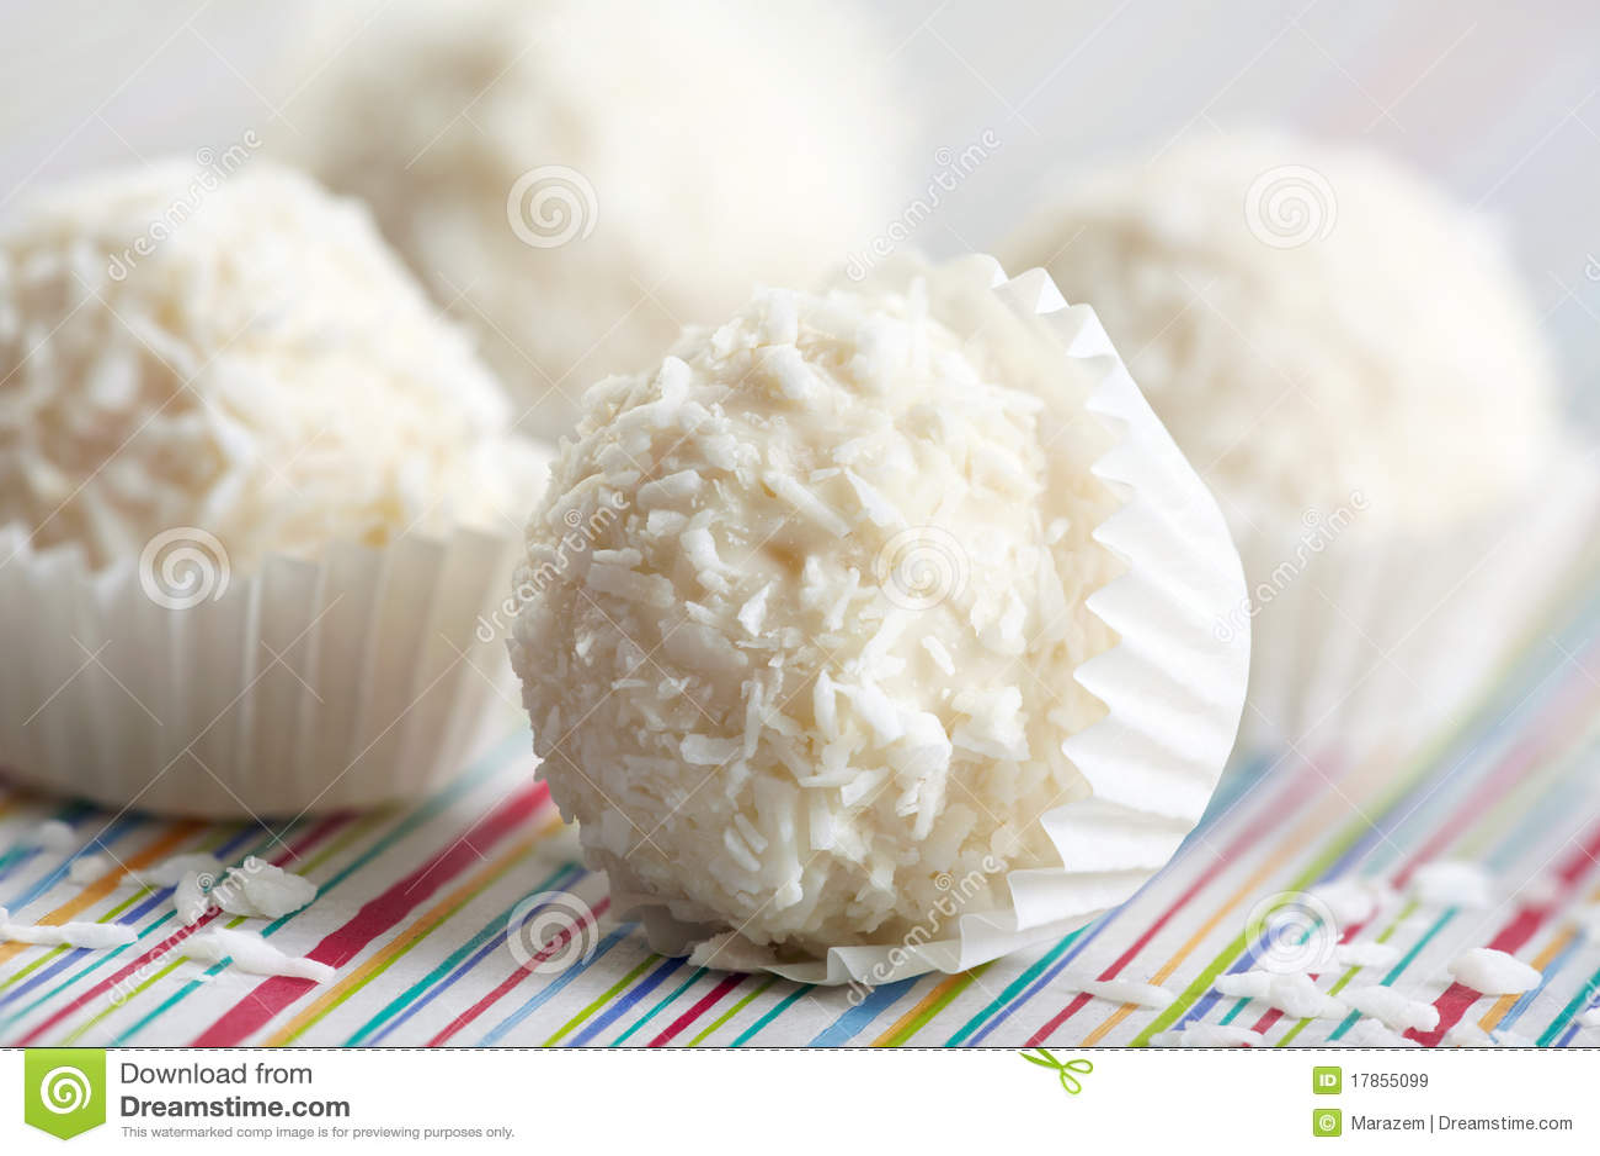 Trufas de chocolate blancas